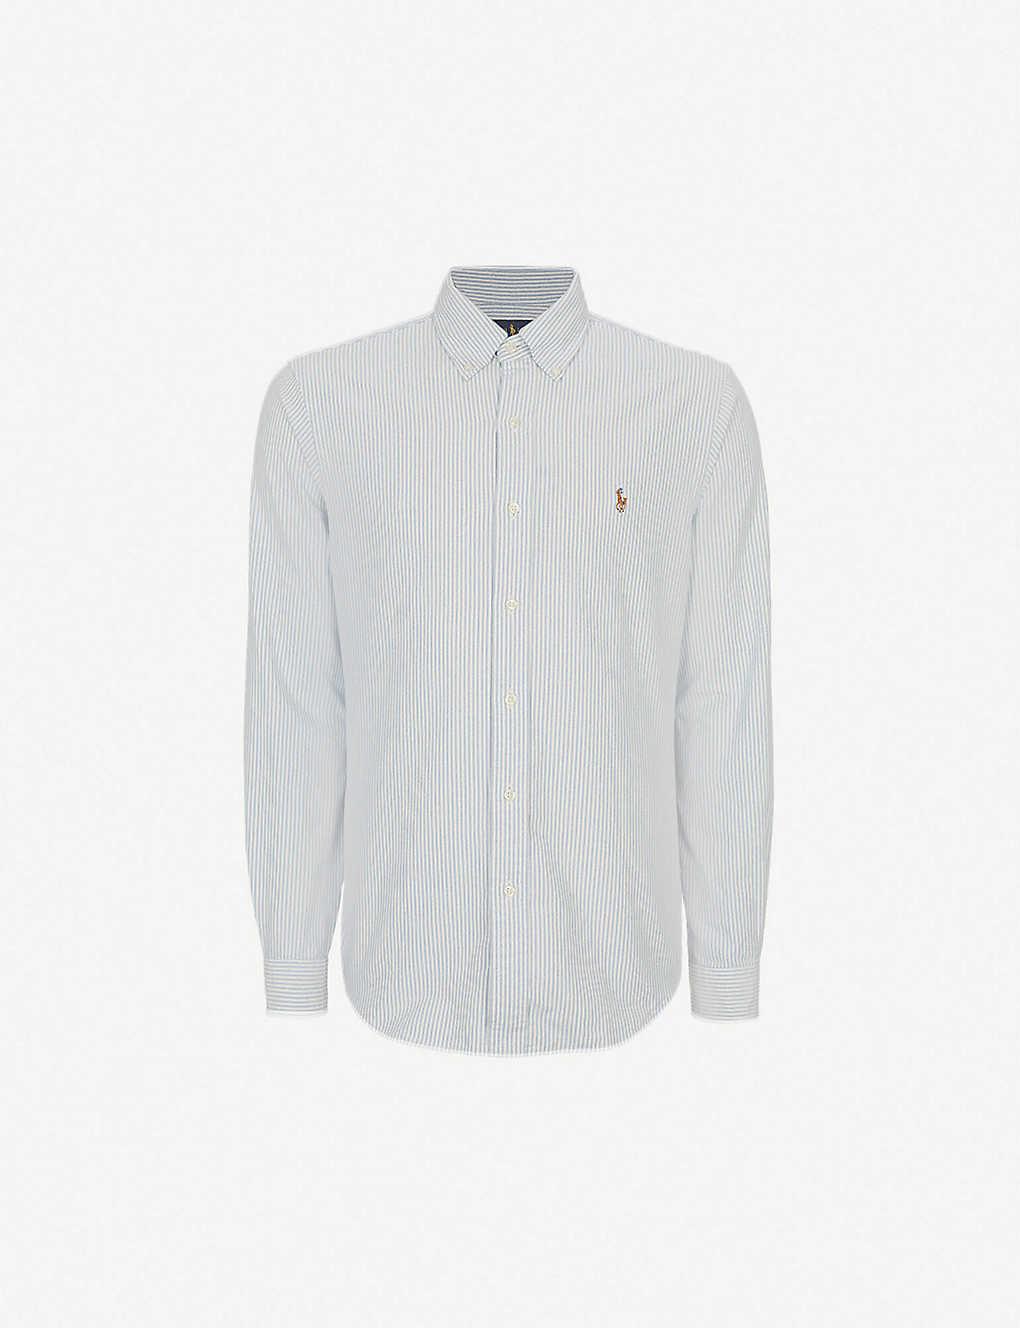 196008f75 Striped Oxford fit single cuff shirt - Bsr bluewhite stripe ...